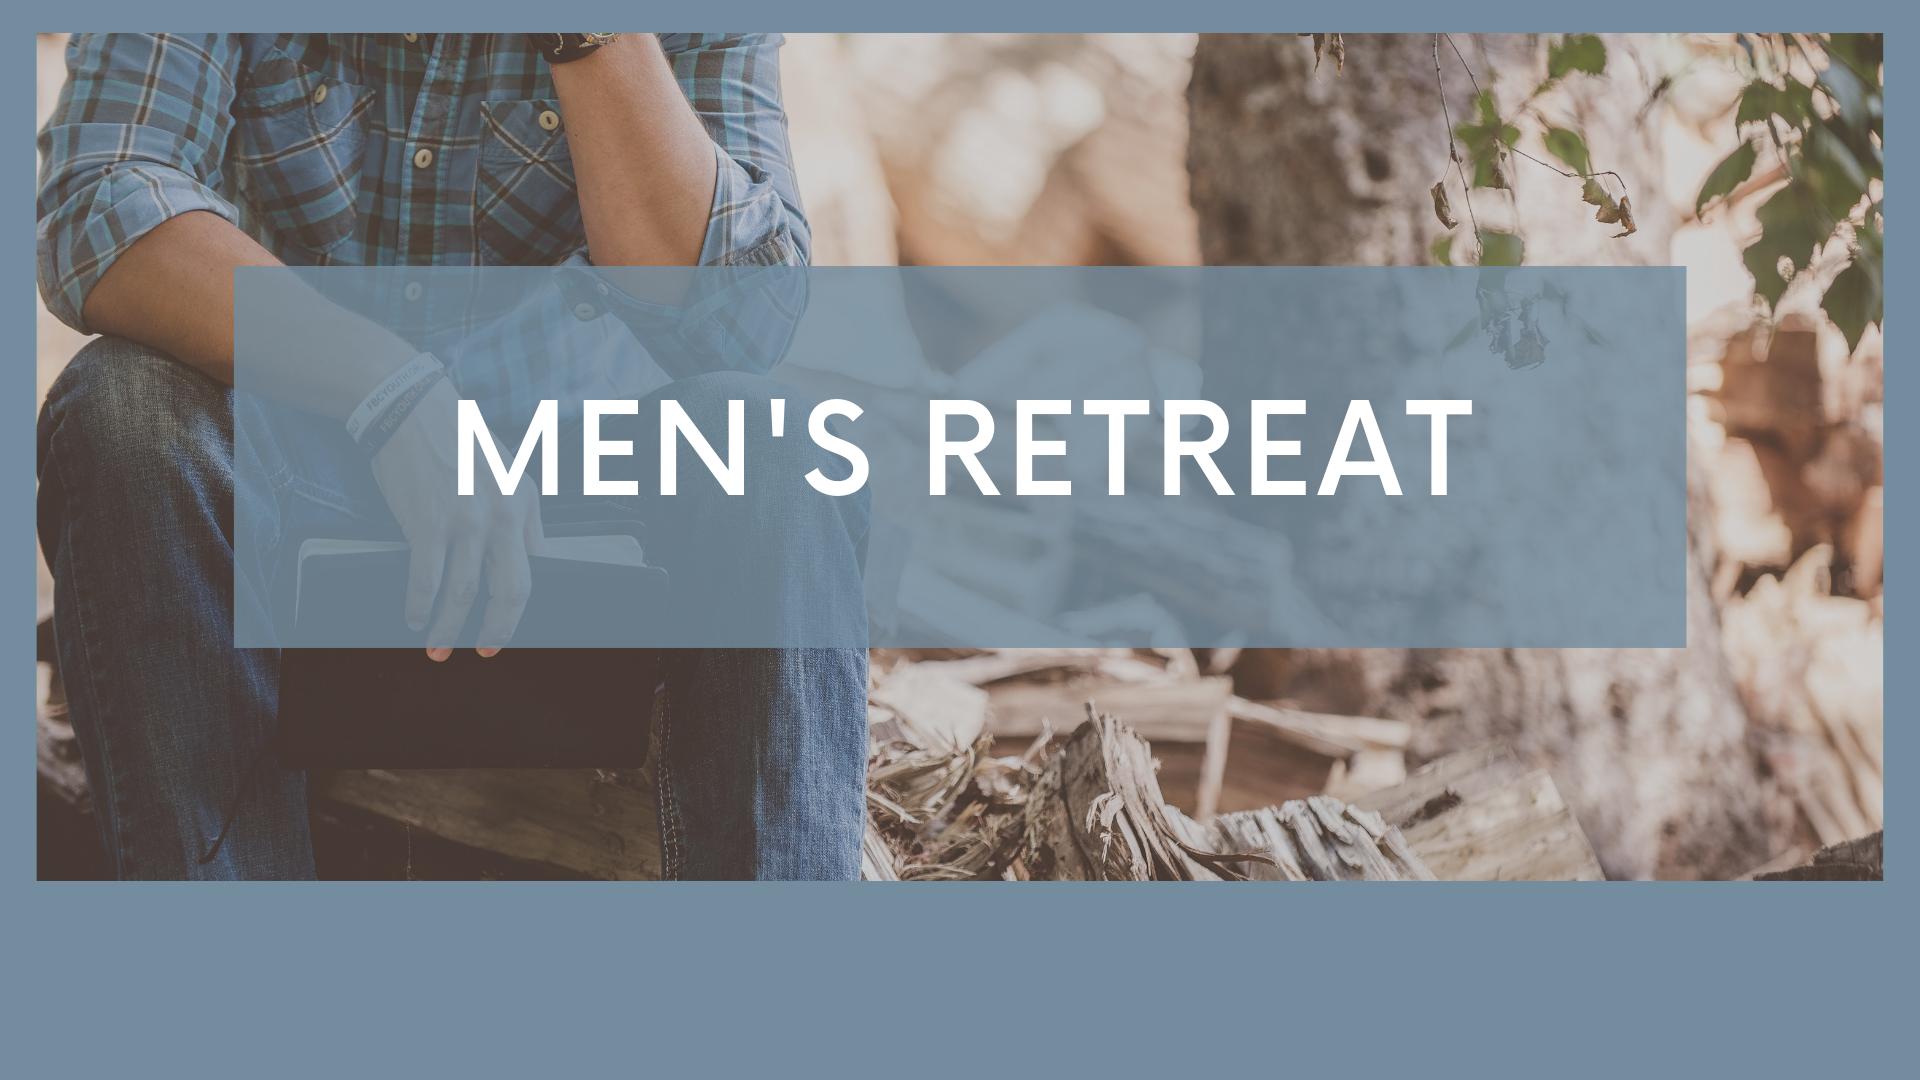 Men's Retreat 17-03-26-374.png